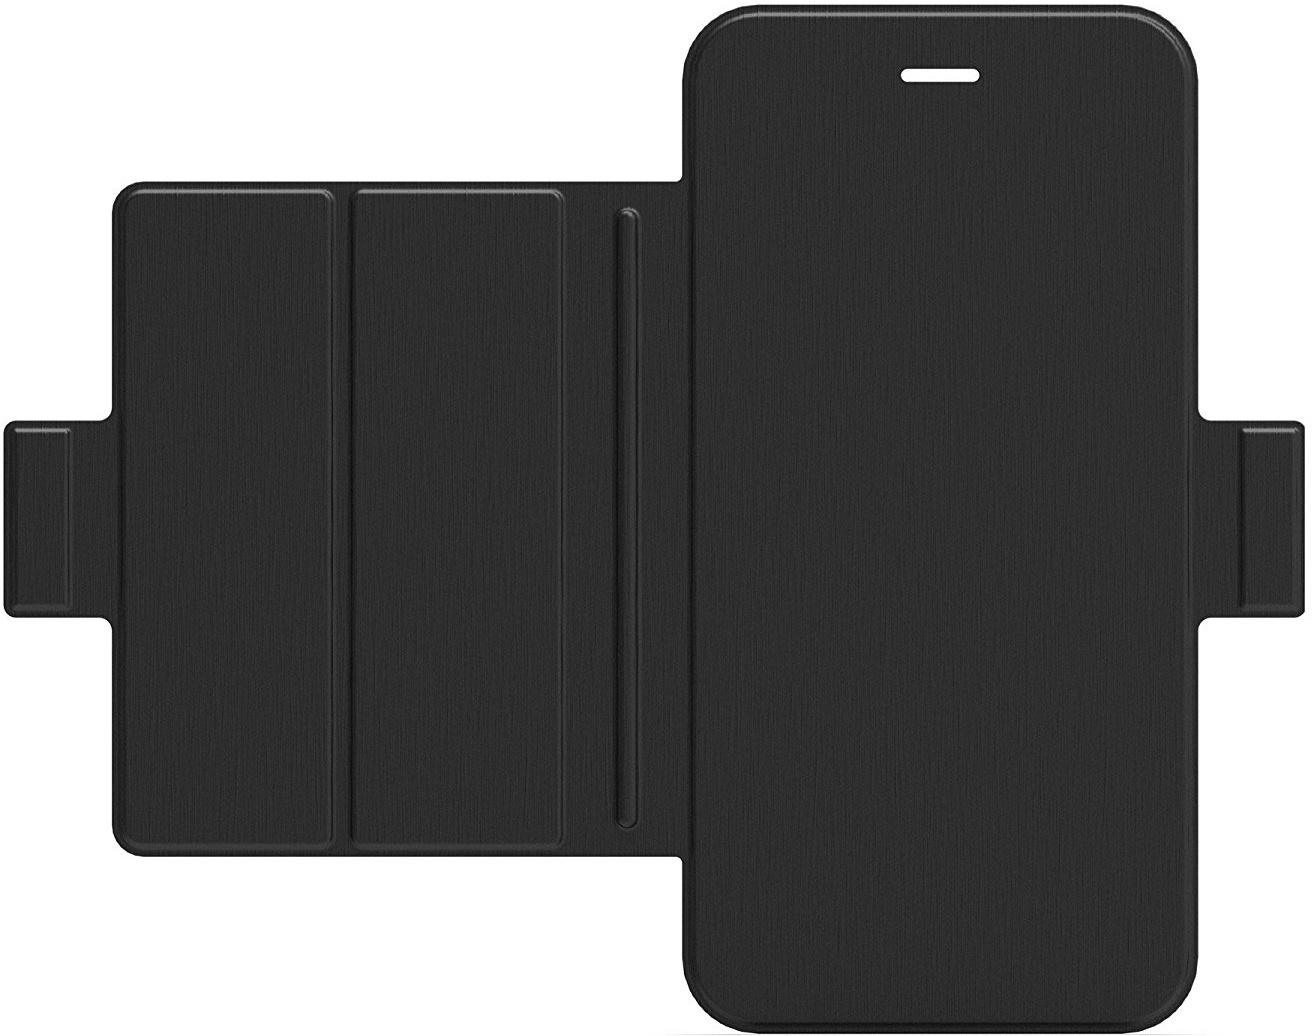 Накладка Mophie Hold Force Folio для чехла Mophie Base Case для iPhone 7. черный цены